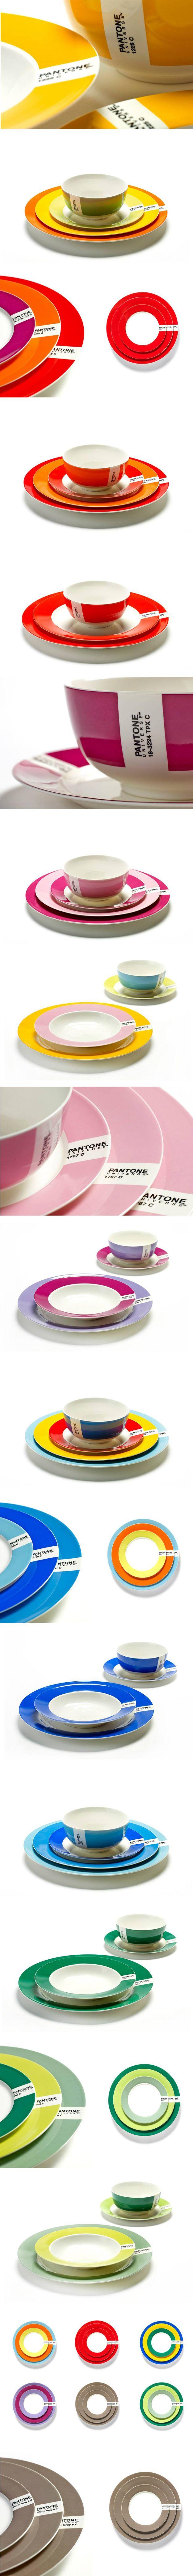 Tableware Pantone collection _ #pantonetableware #tableware #pantone